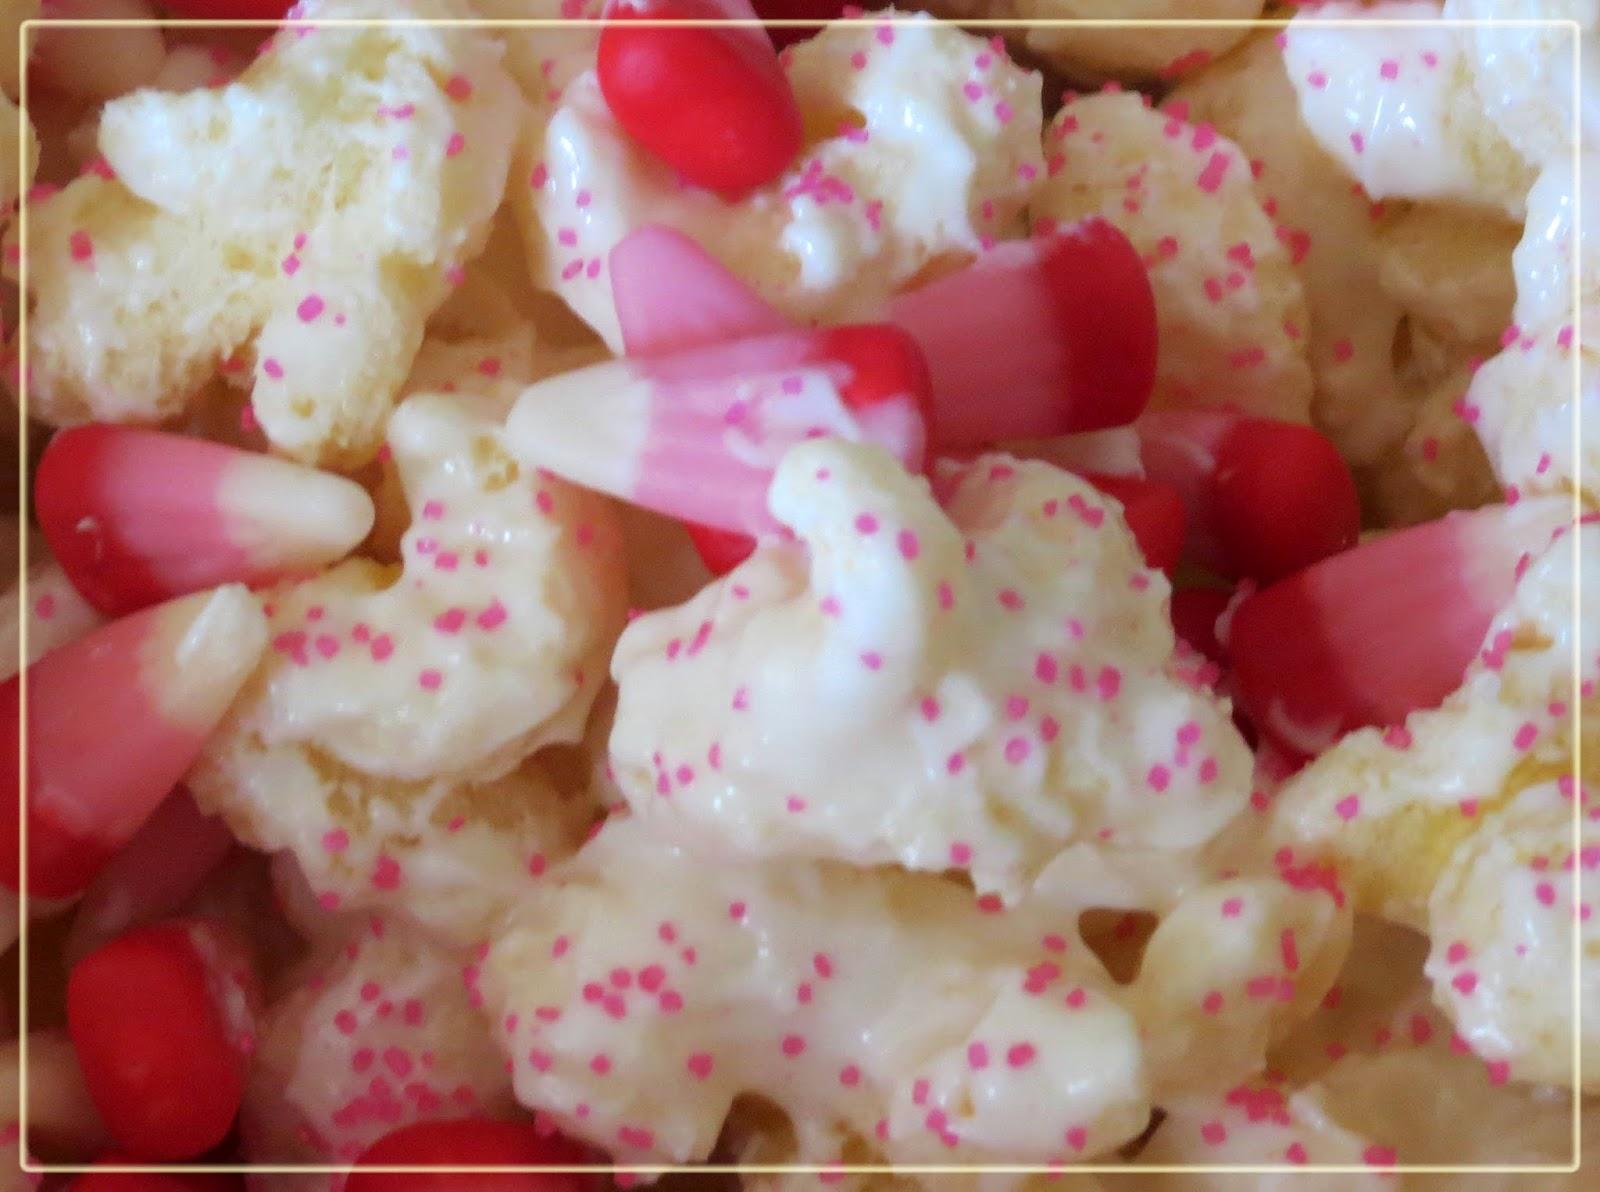 Rebekah's EaTs & TrEaTs: White Chocolate Puff Corn